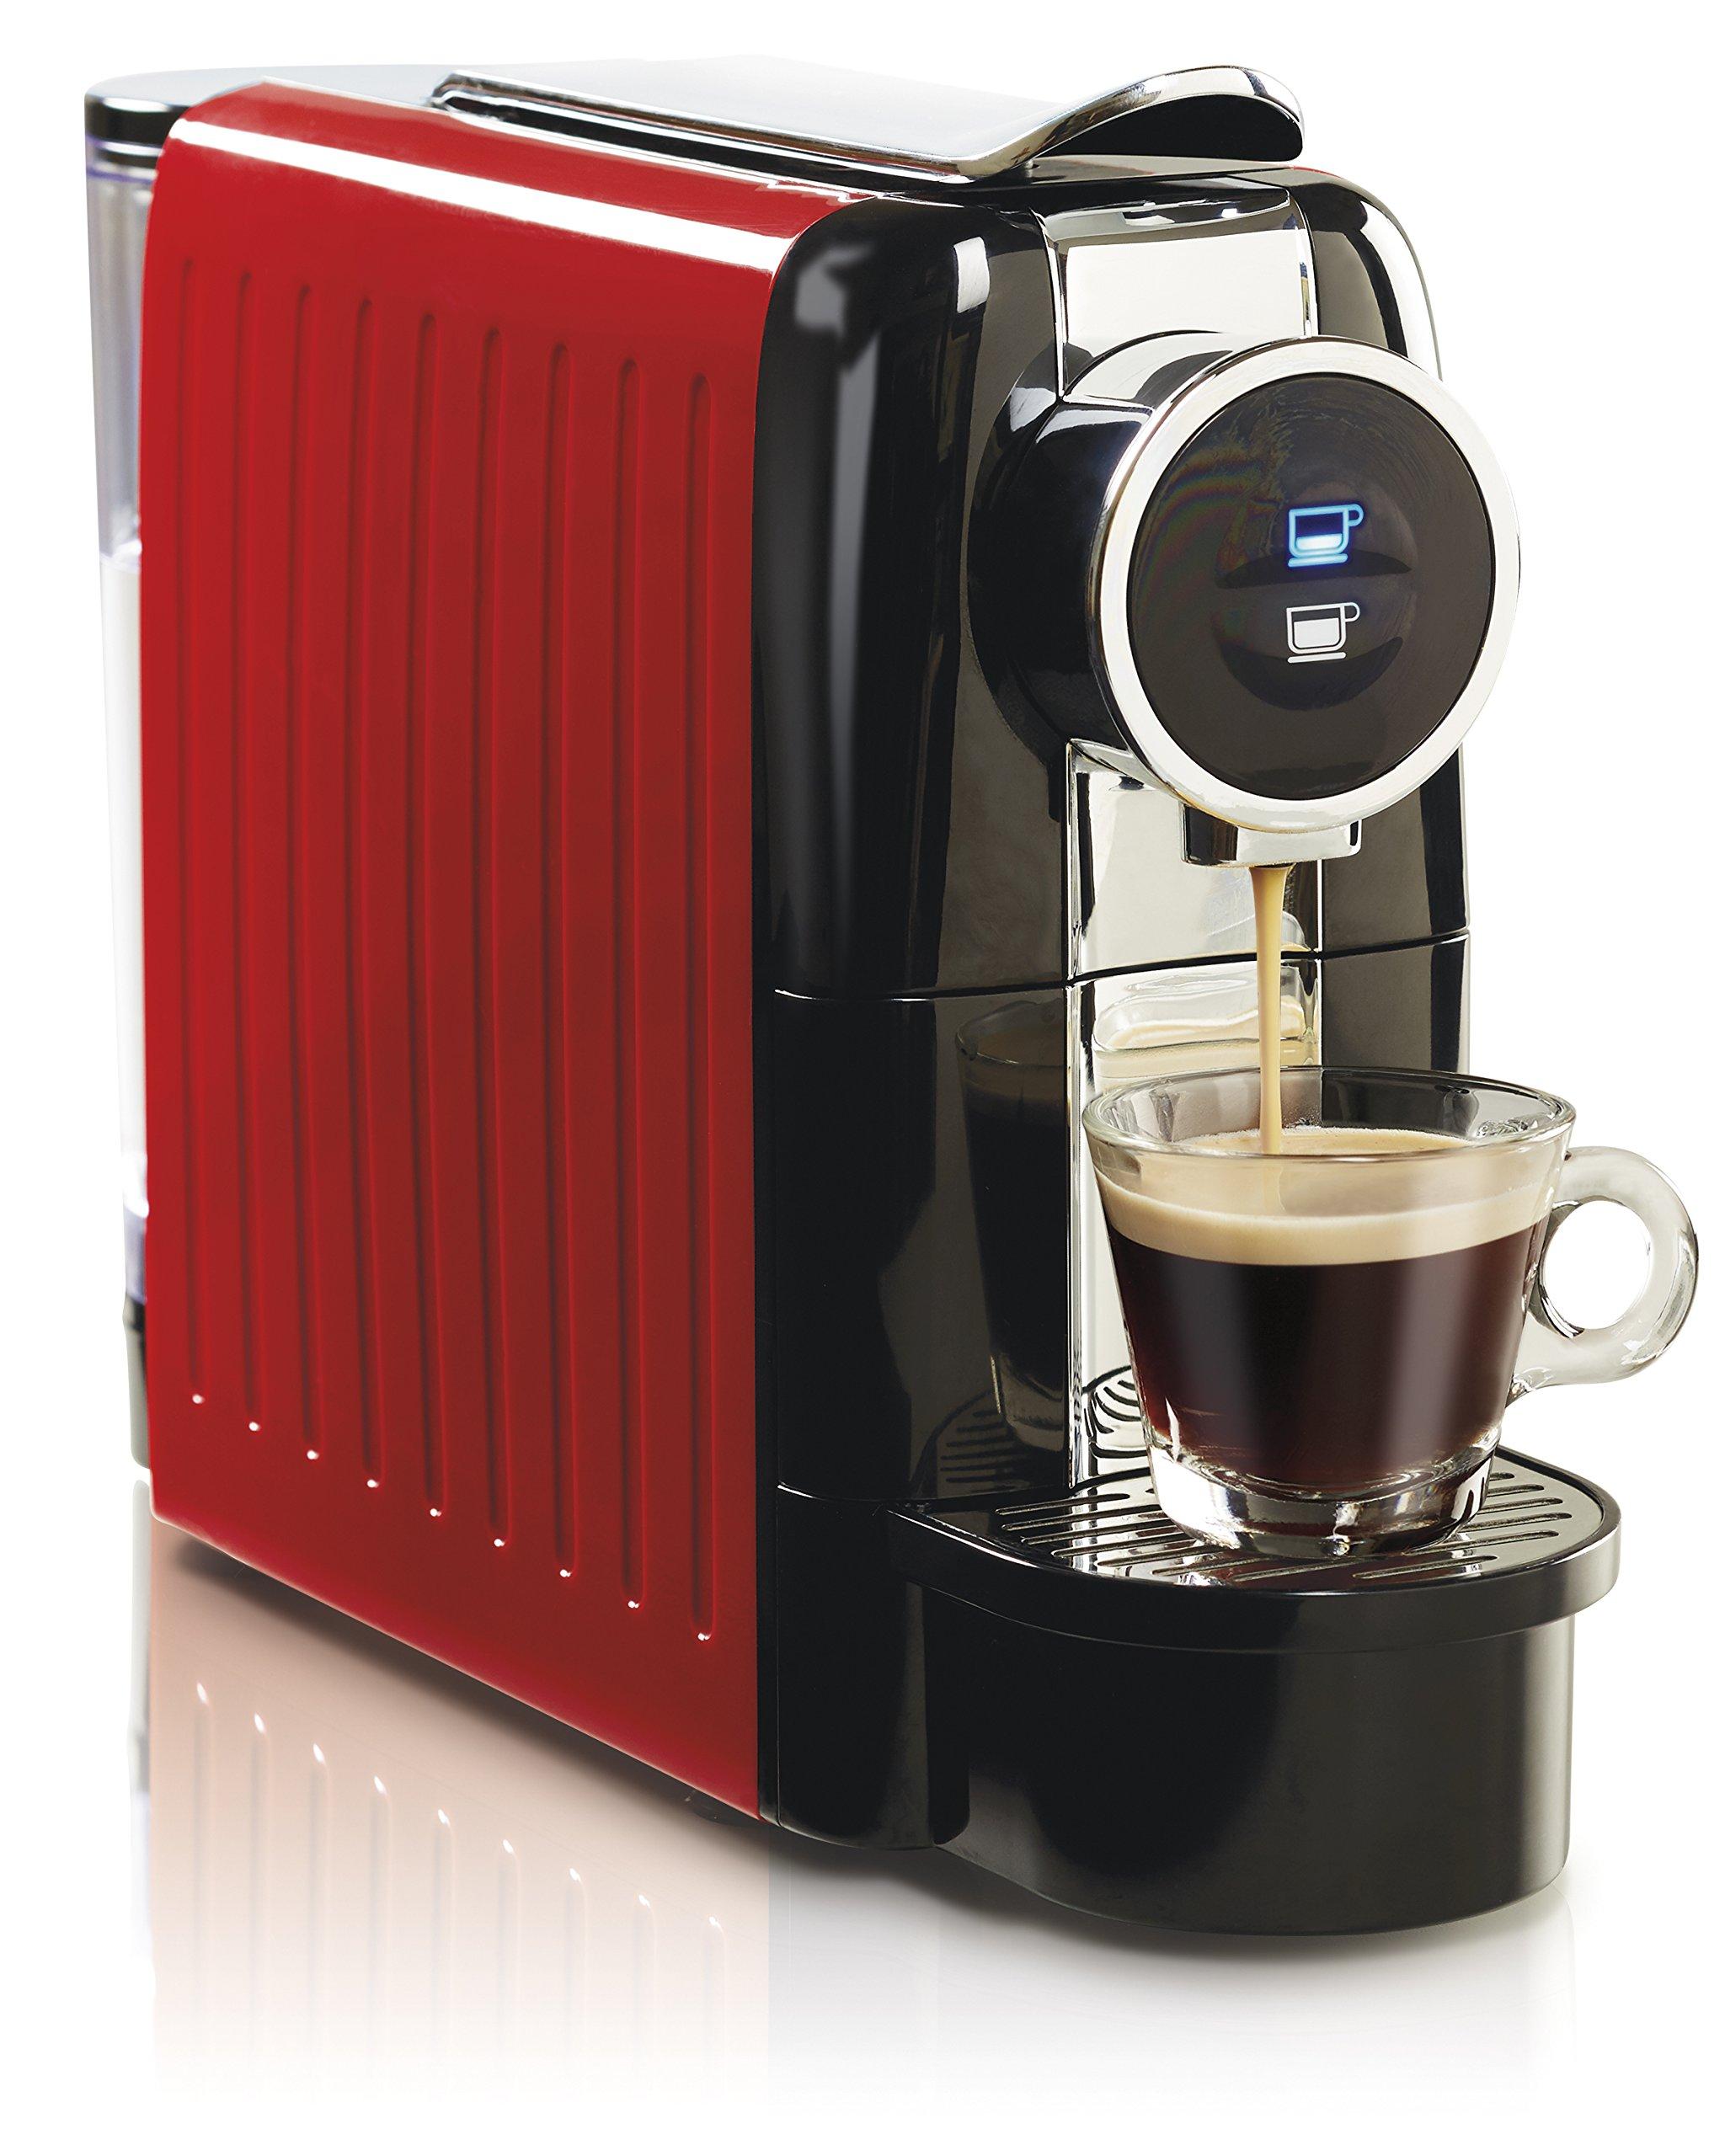 Hamilton Beach Espresso and Lungo Coffee Machine, 19 Bar Italian Pump, Holds 13 Capsules, 22 Oz Water Tank, Red (40725) by Hamilton Beach